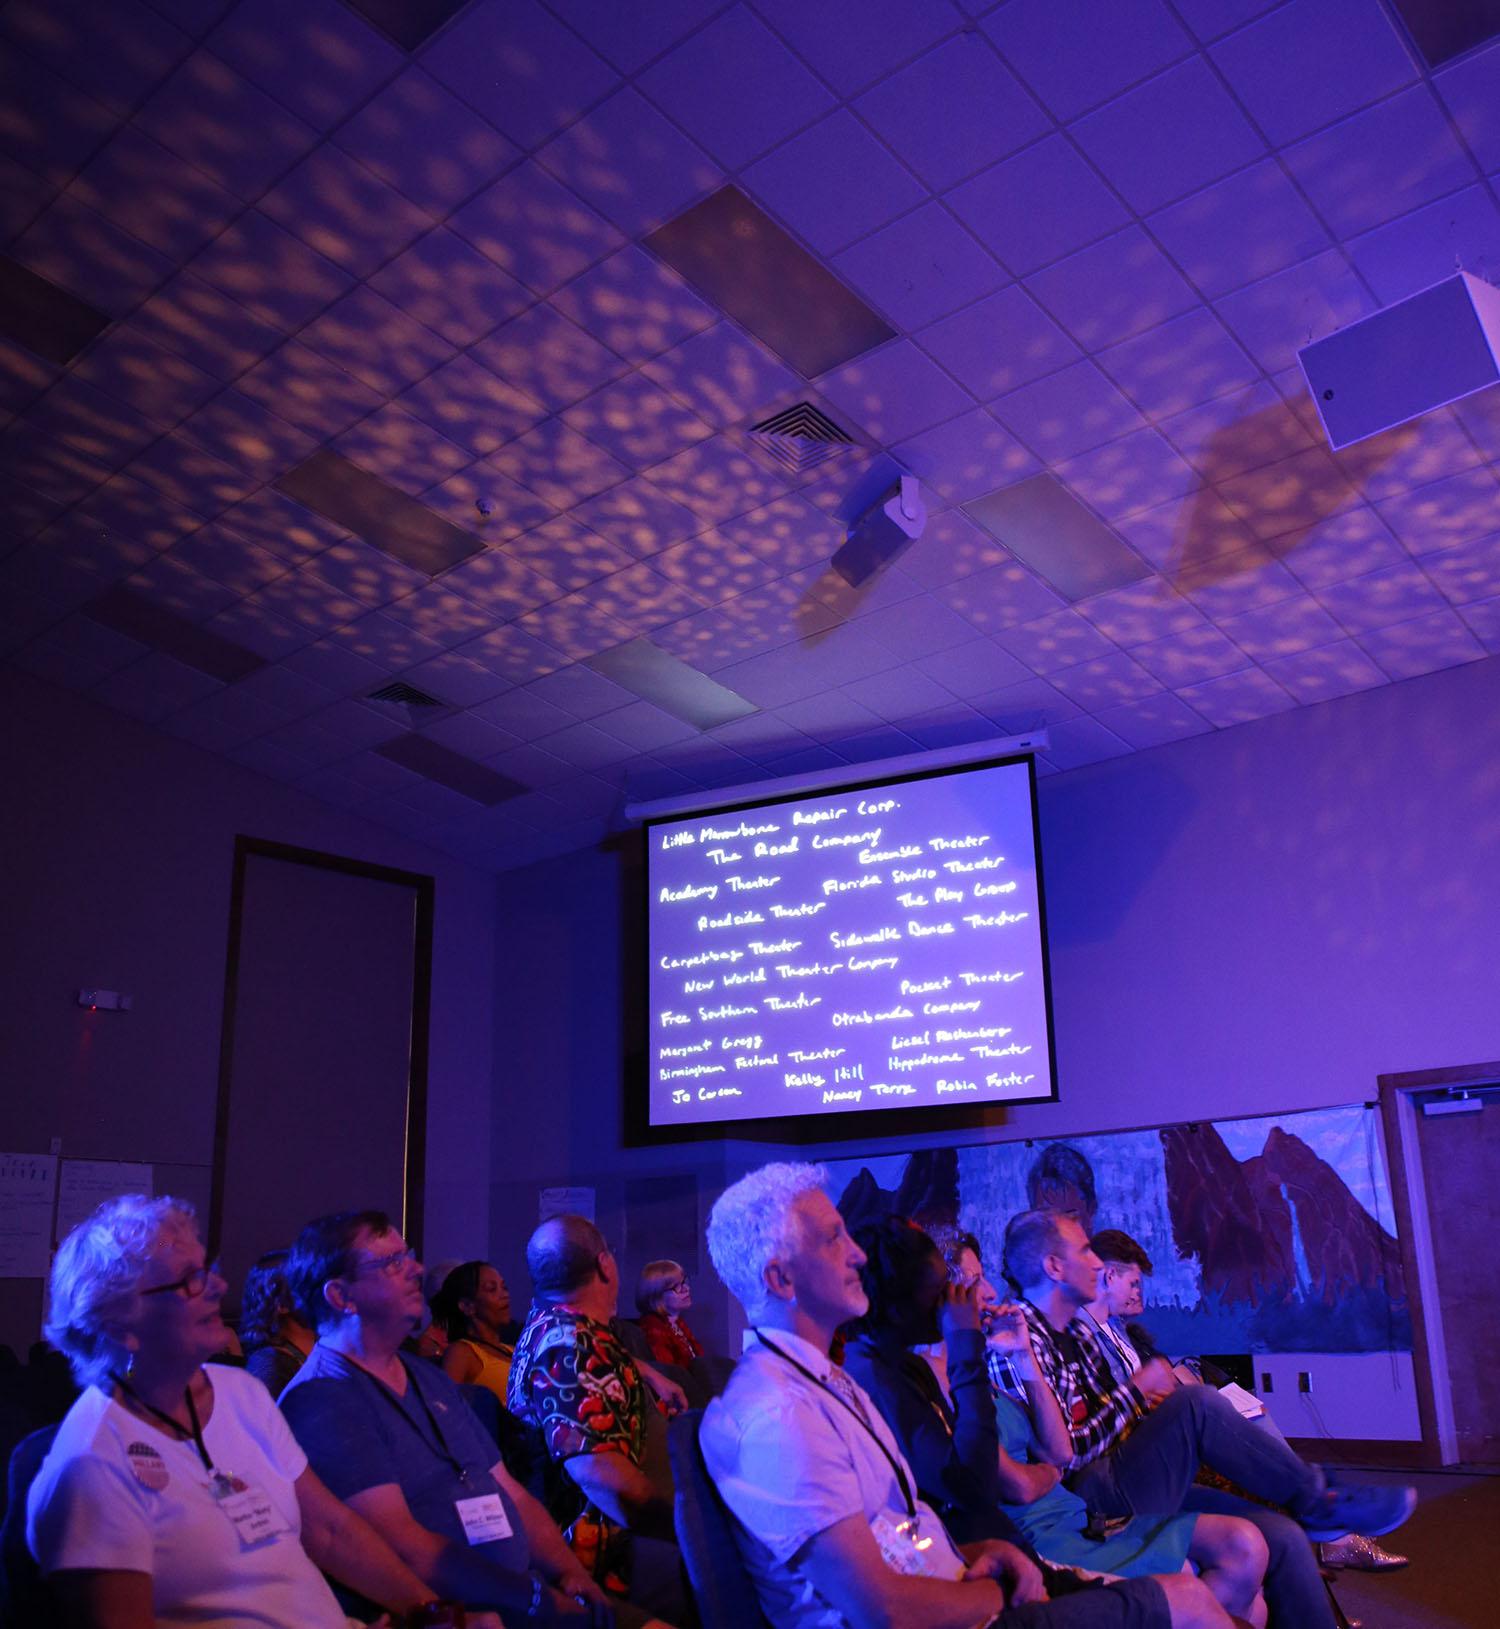 glassceiling-audience.jpg